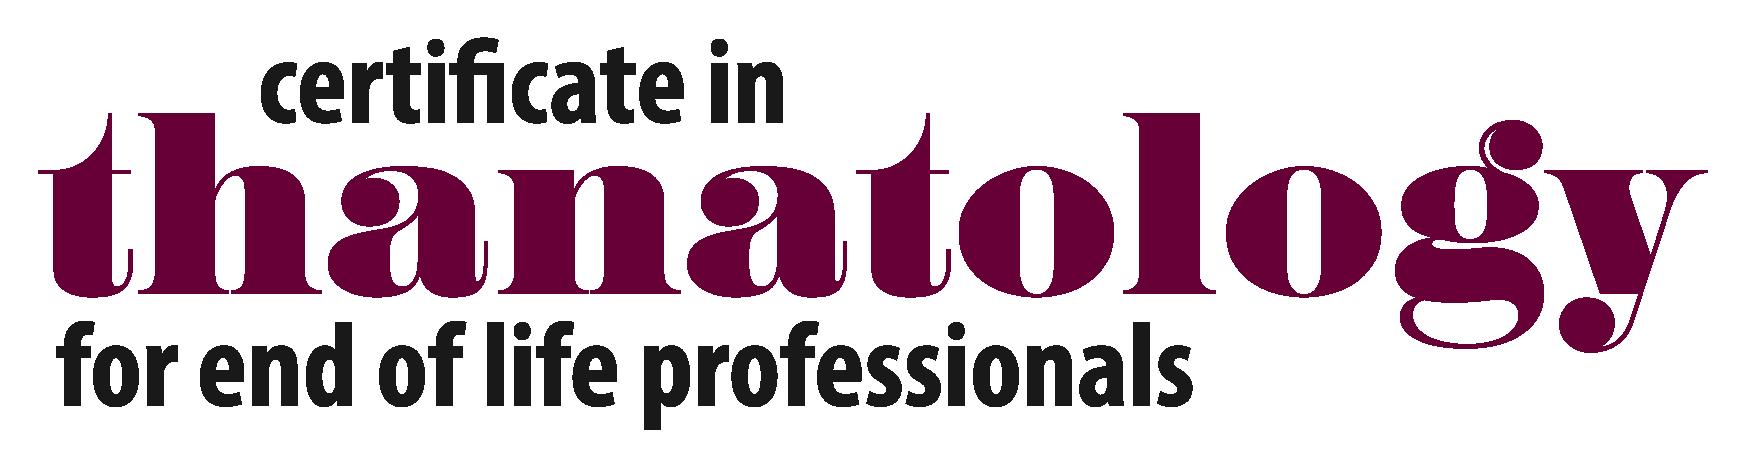 PMC-Certificate-Logos-Thanatology-01.png